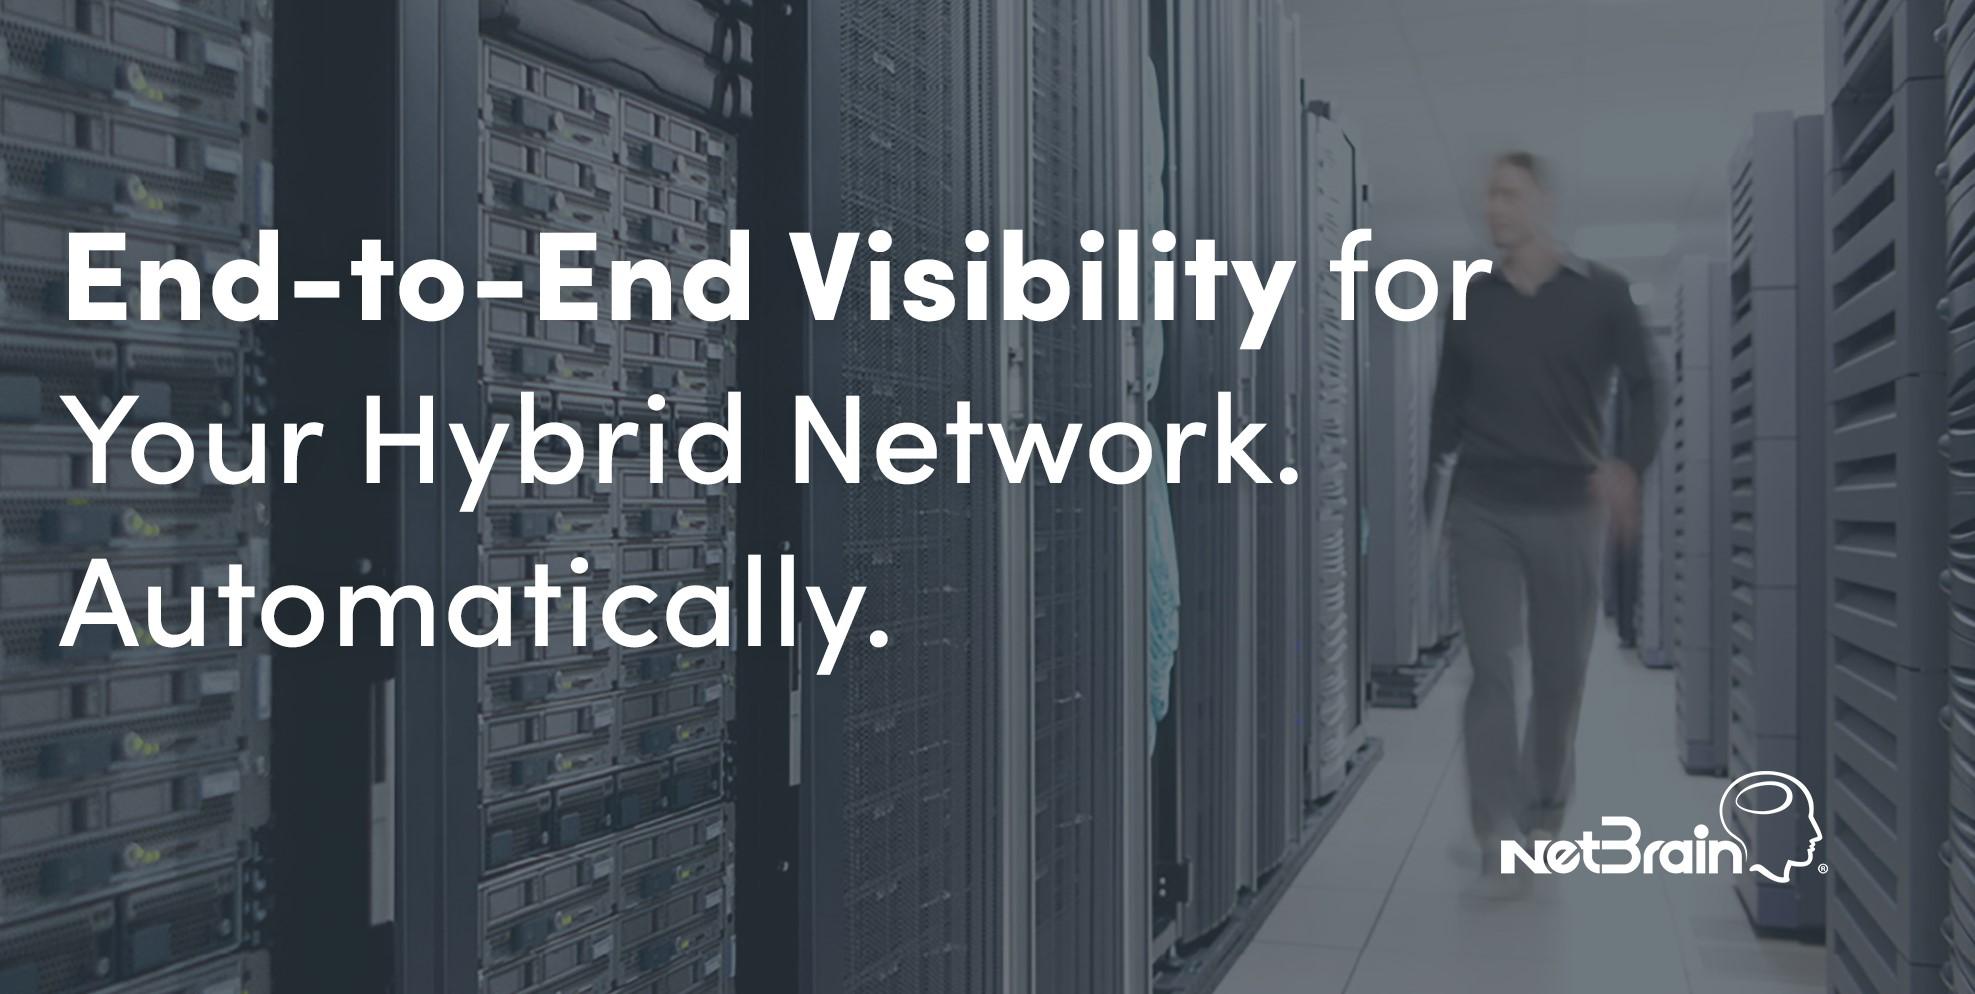 NetBrain Hybrid Network Visibility